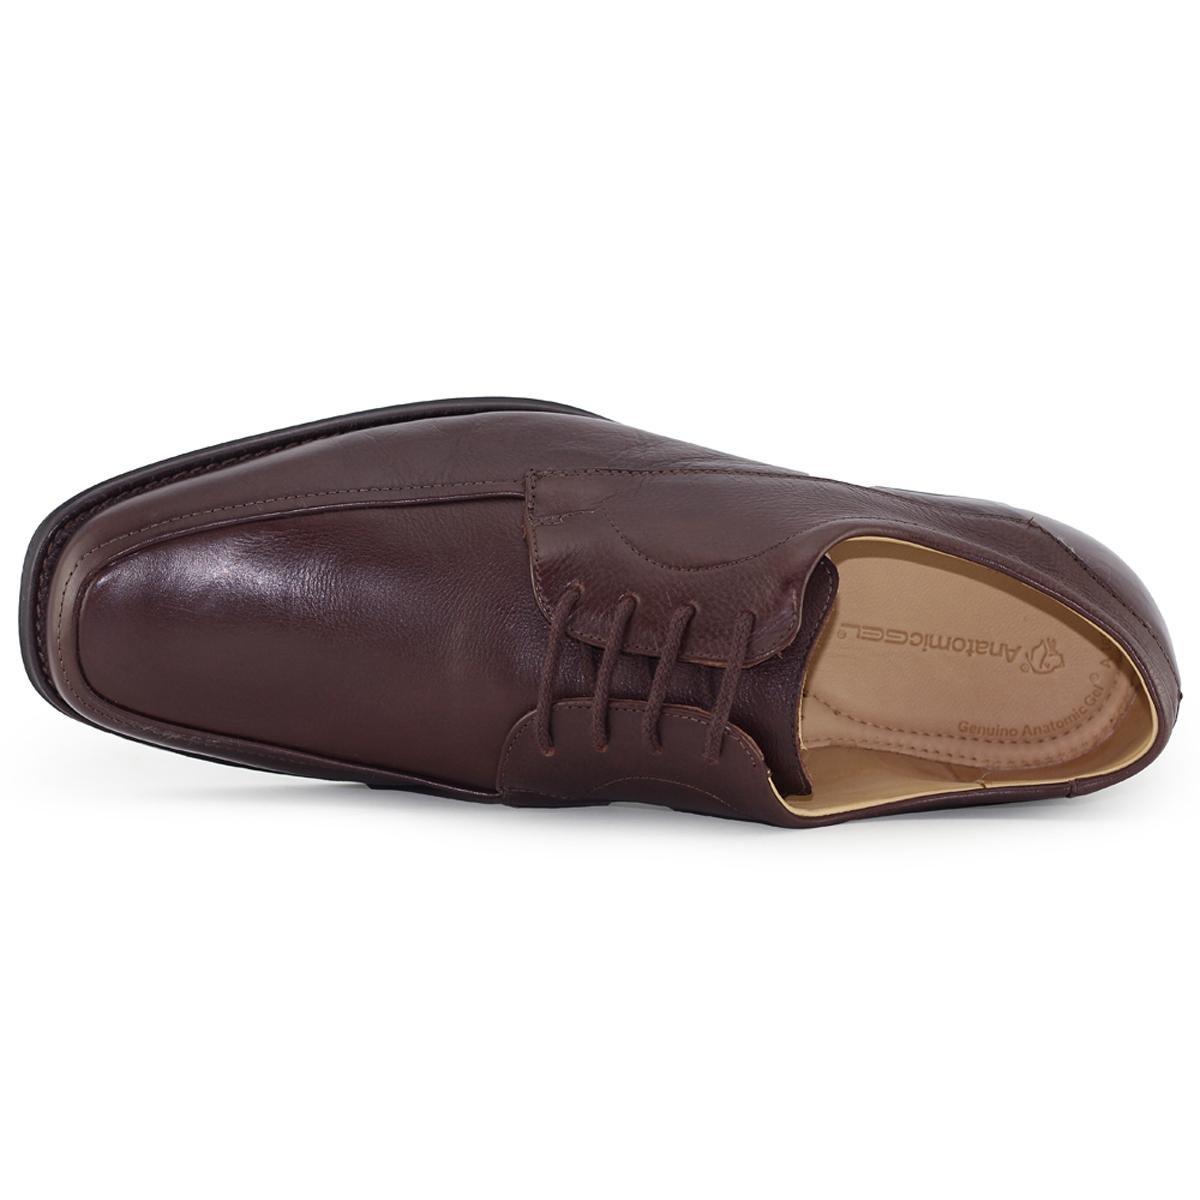 fc12dfd6b Sapato Social Anatomic Gel Elegance Brown Masculino - Marrom Escuro ...